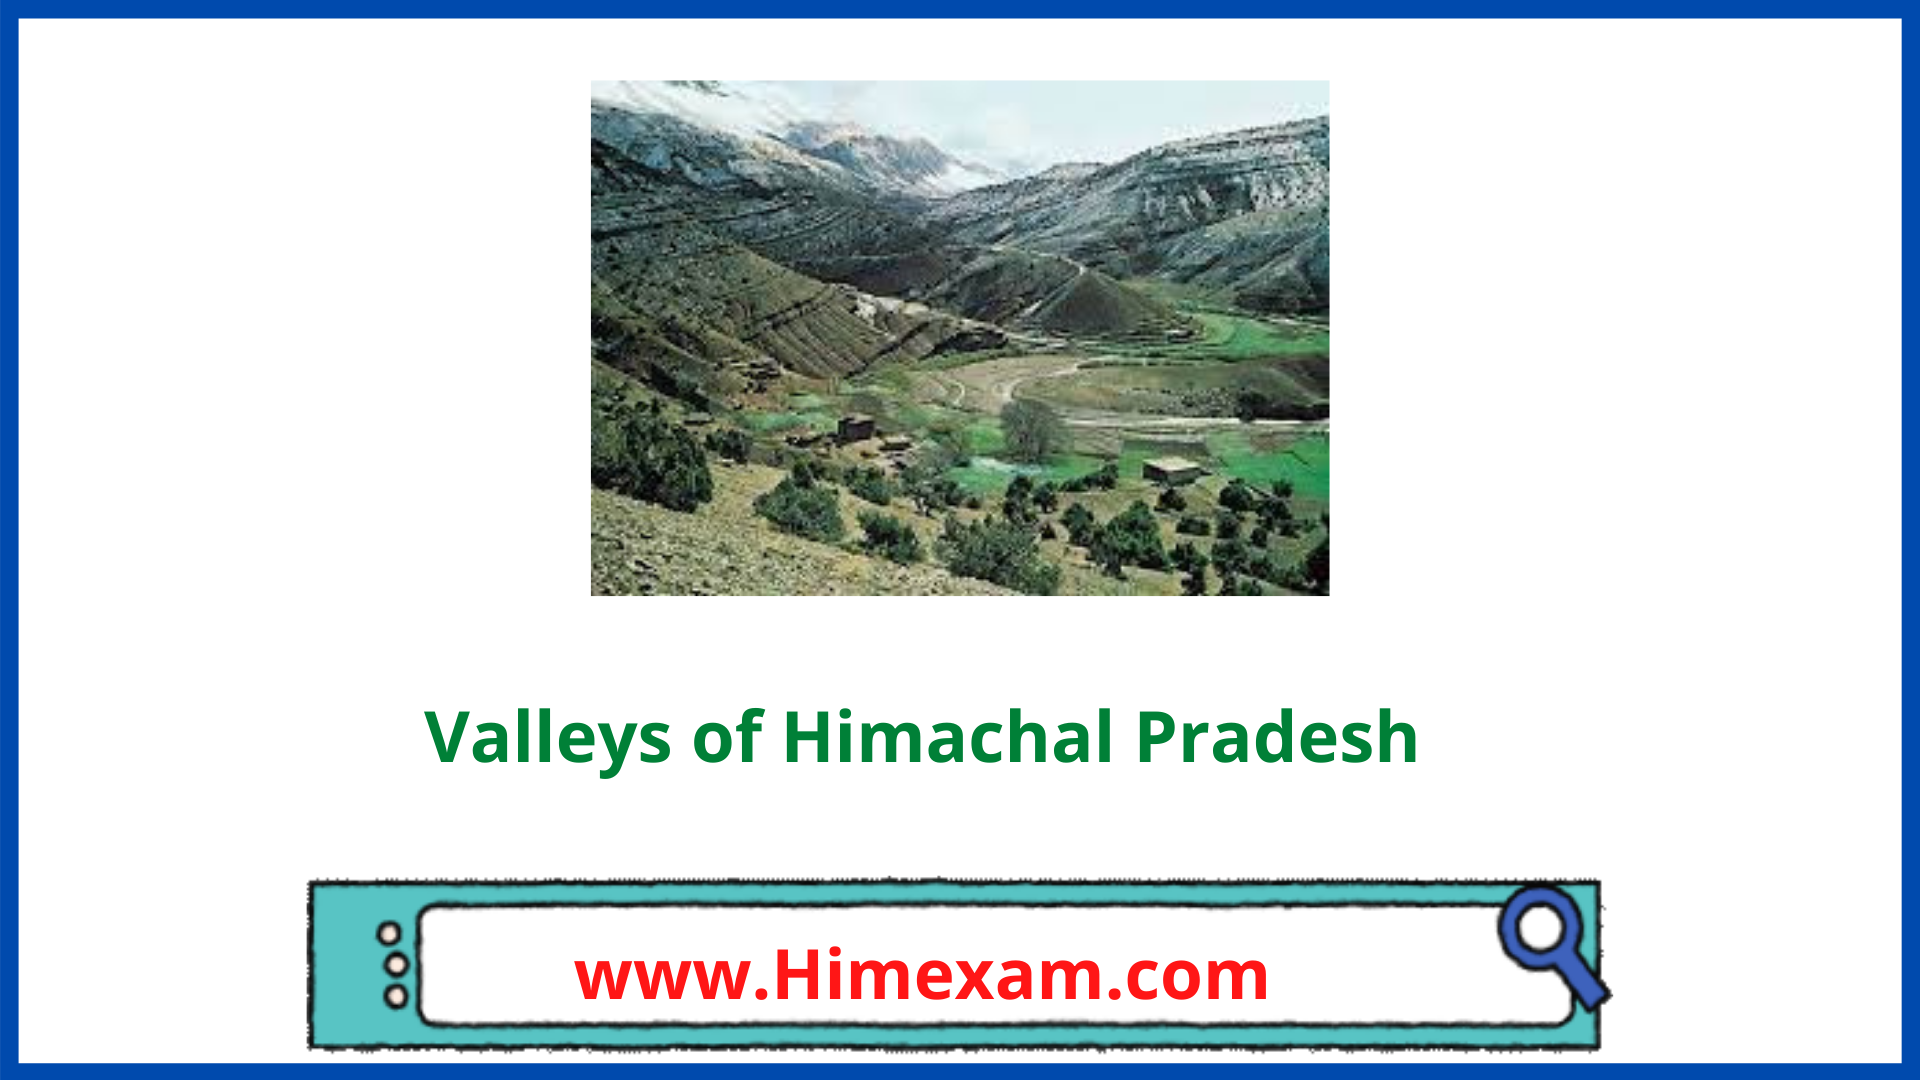 Valleys of Himachal Pradesh